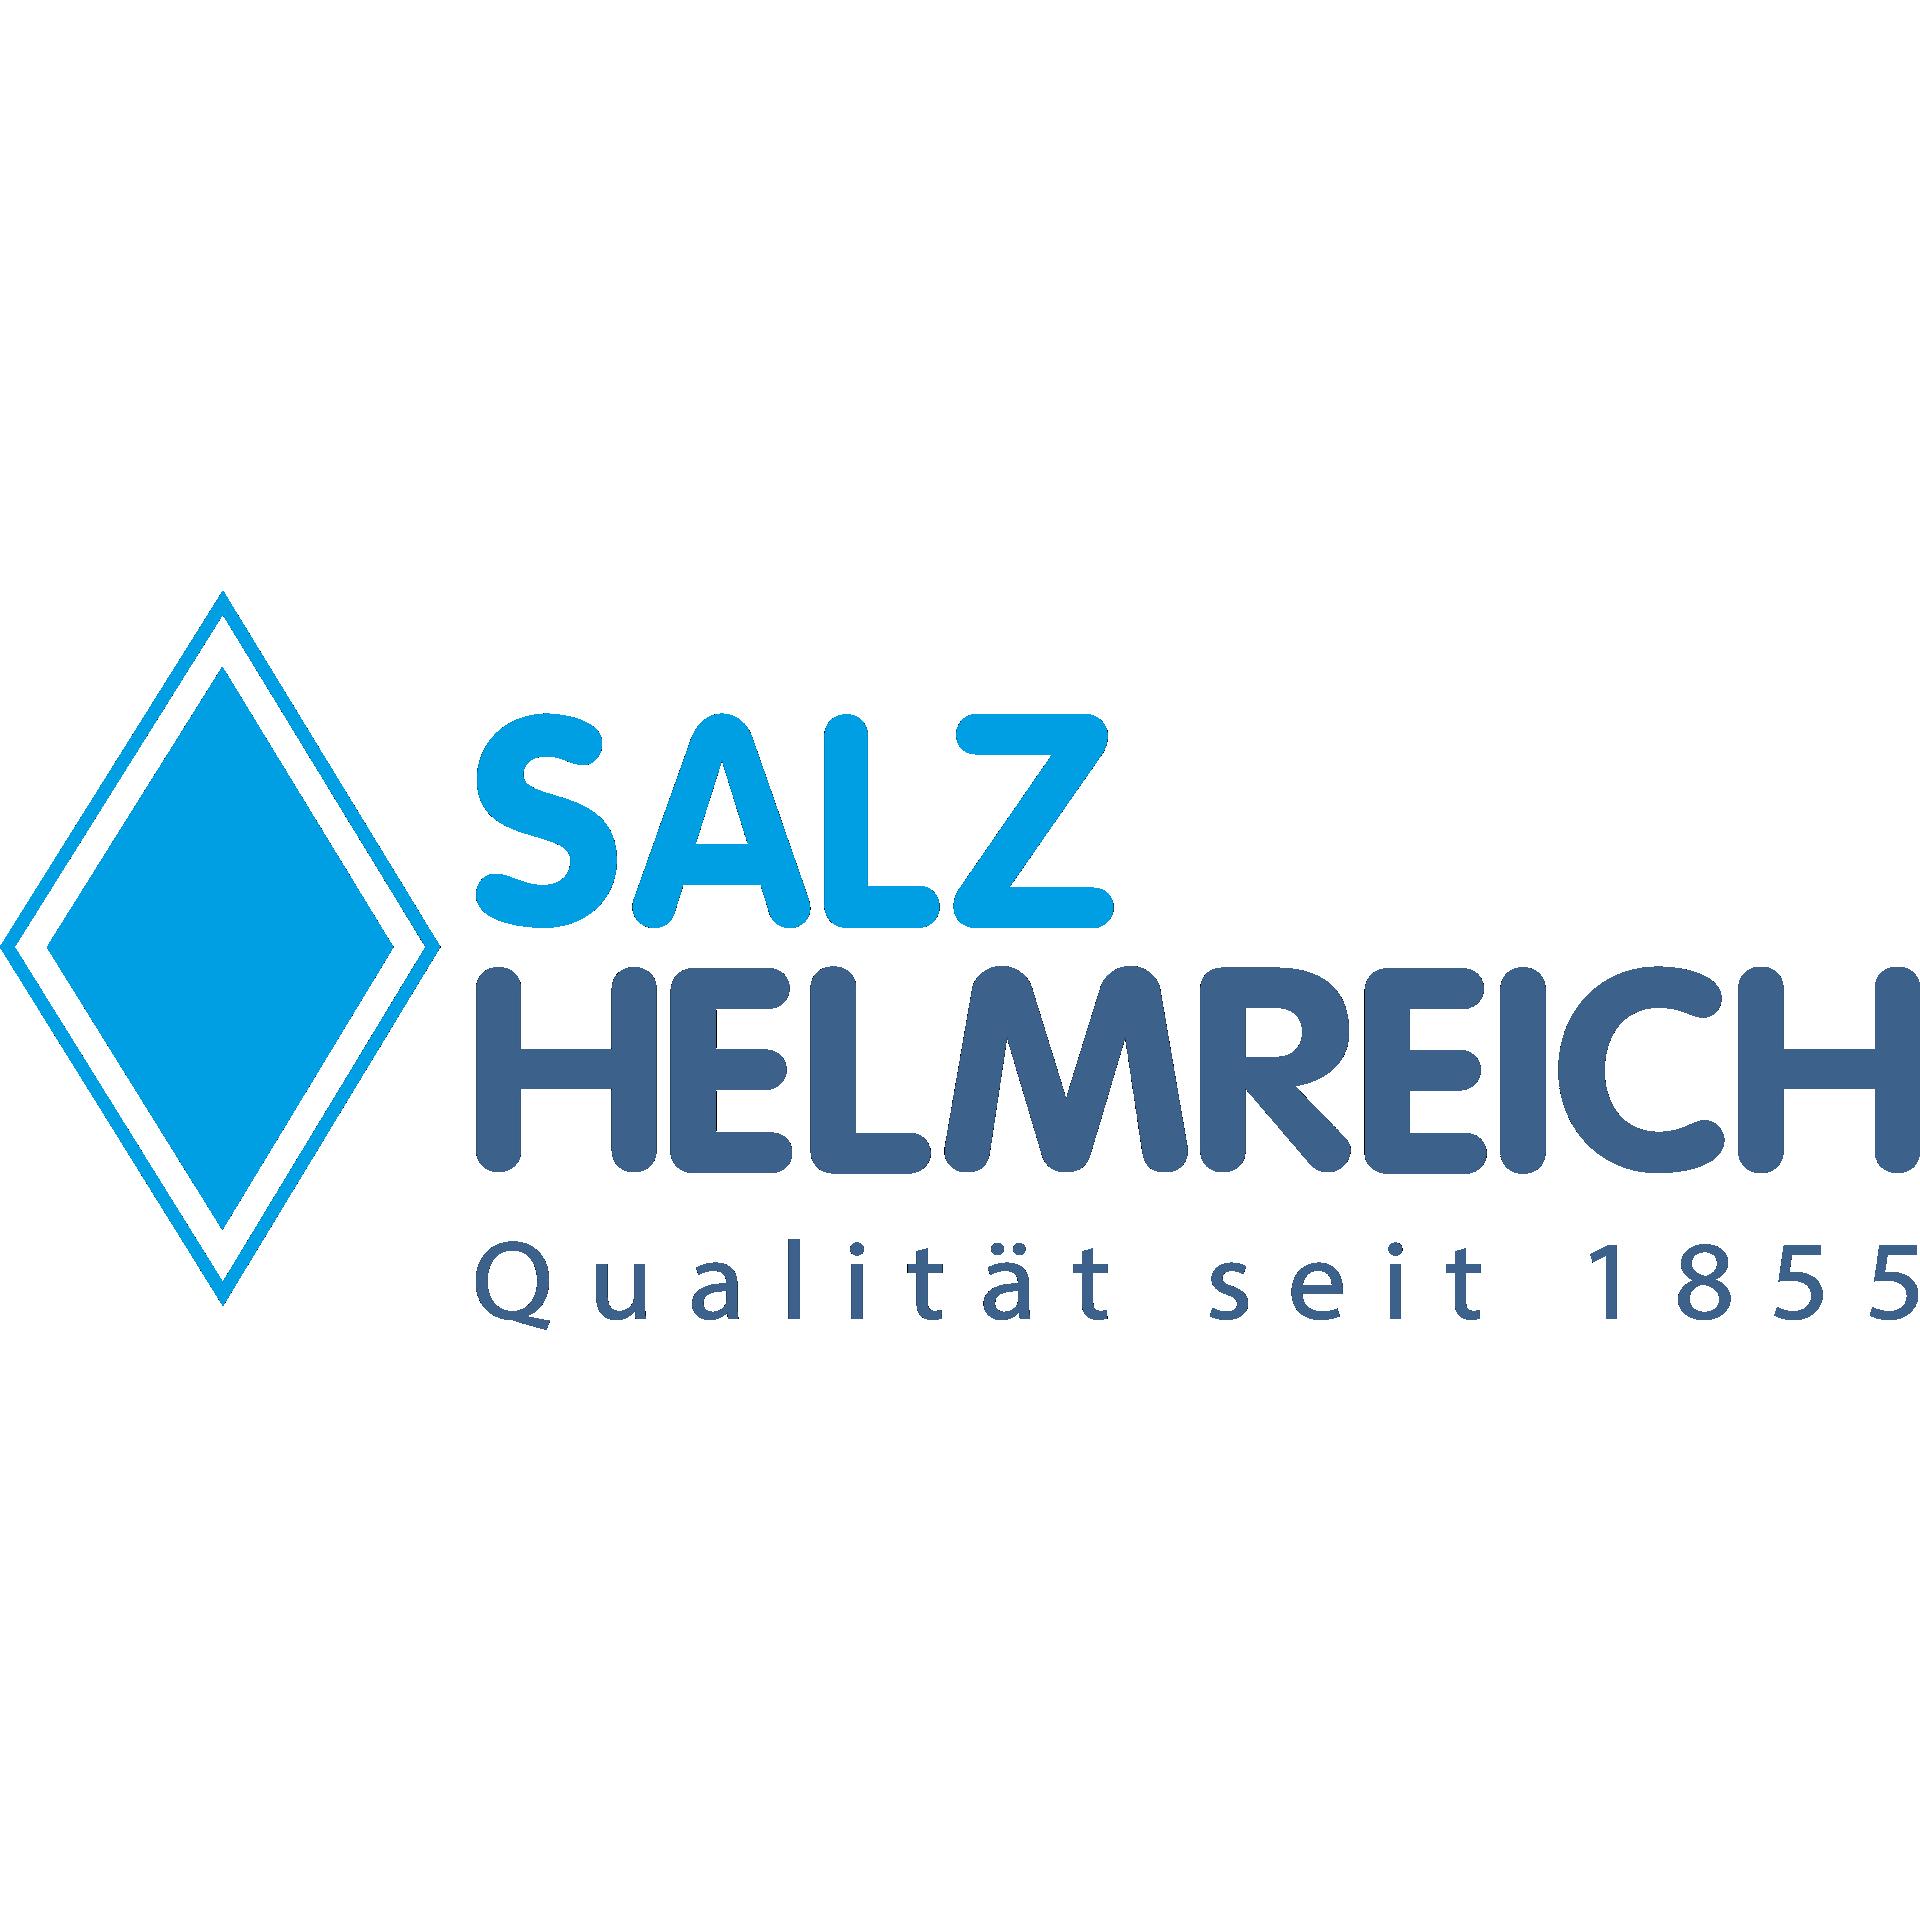 Siede-Speisesalz Standard 0,10-0,71 mm im 25 kg Sack